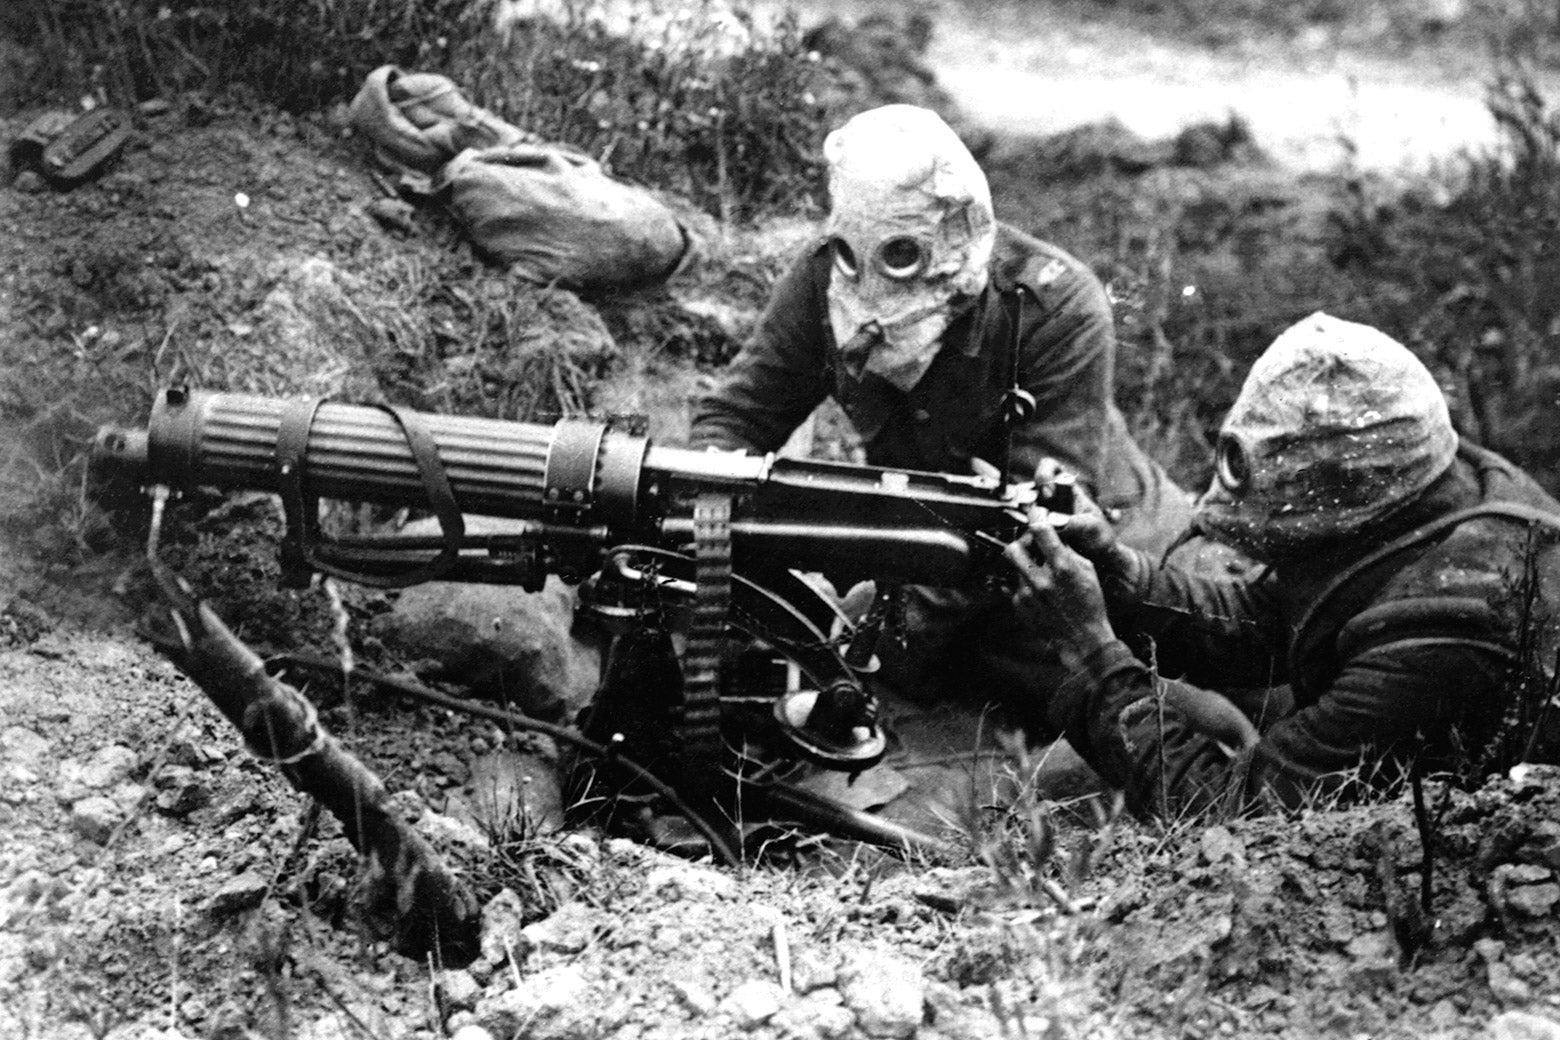 British machine gunners with gas masks on.